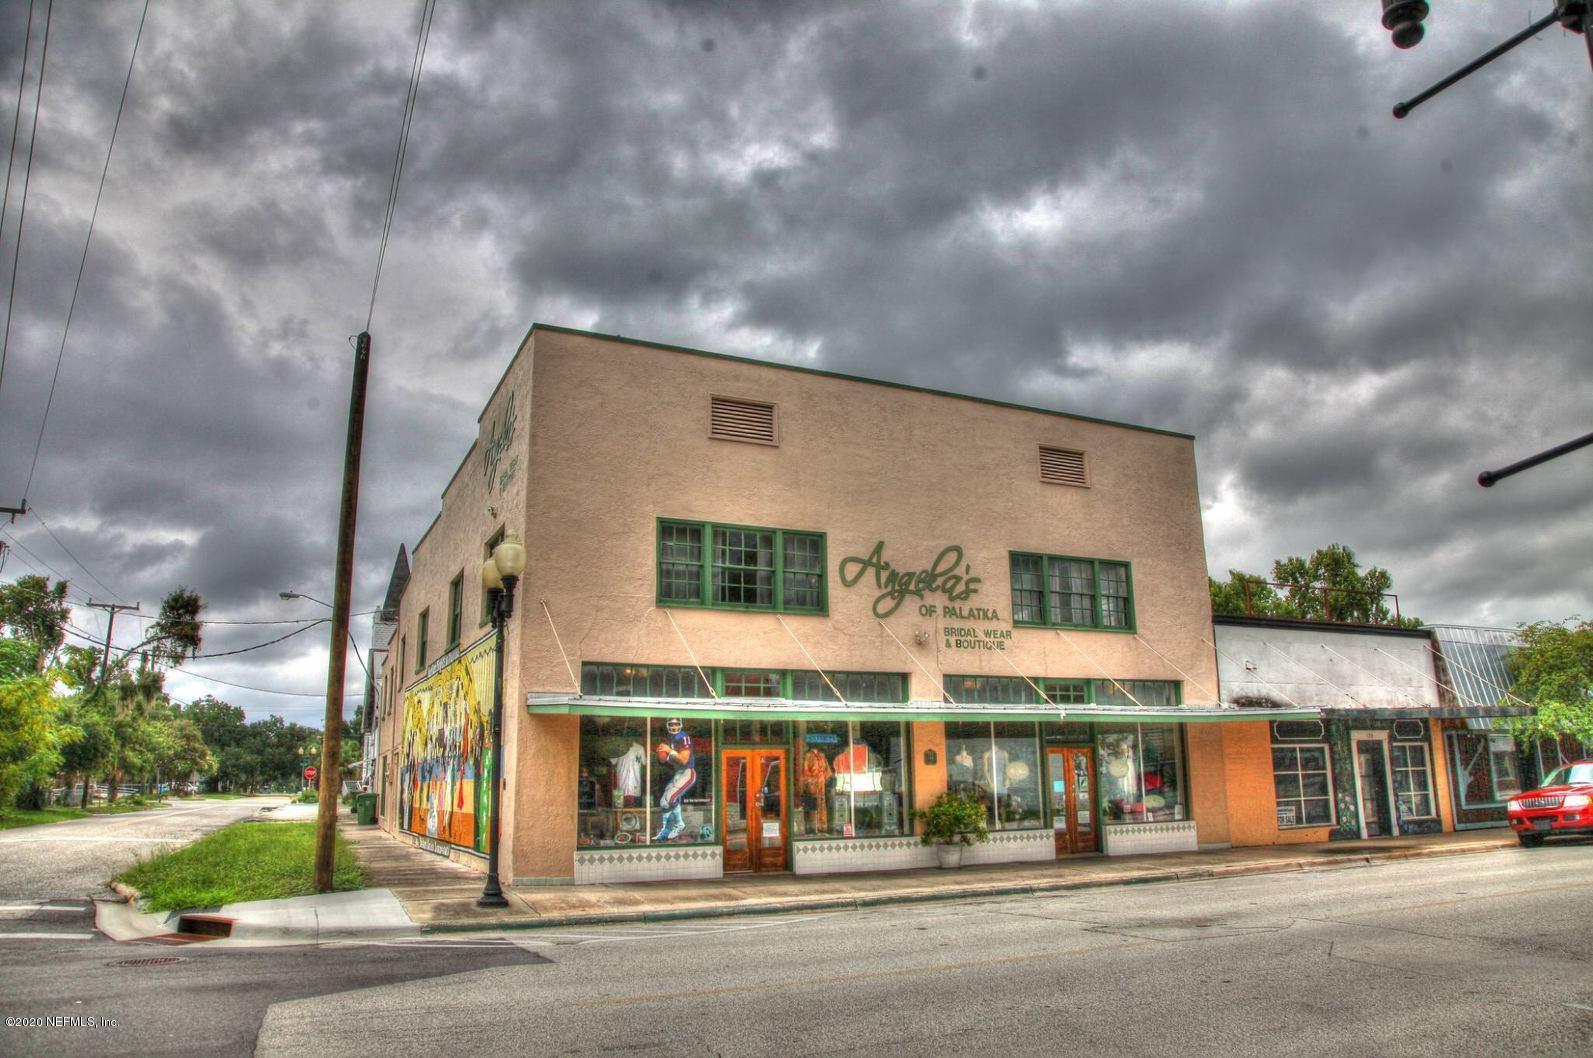 726 ST JOHNS, PALATKA, FLORIDA 32177, ,Commercial,For sale,ST JOHNS,1033911